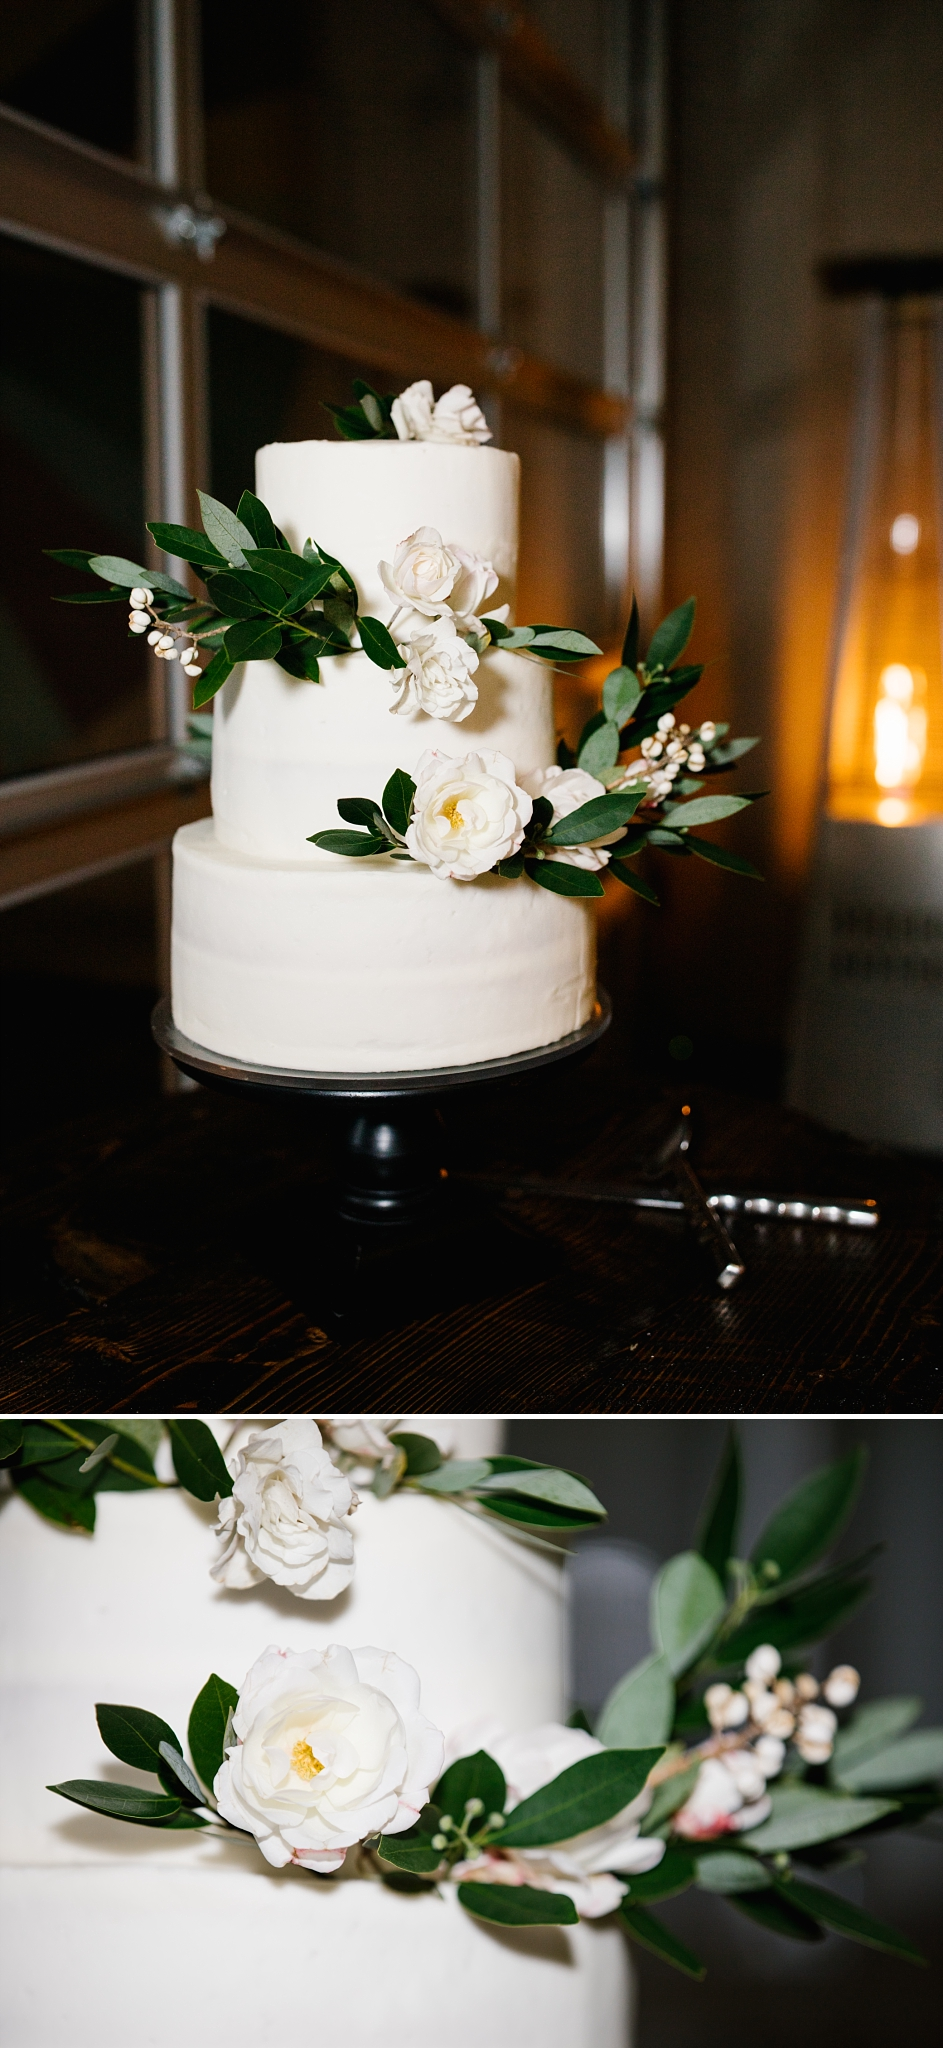 CN-Wedding-326_Lizzie-B-Imagery-Utah-Wedding-Photographer-Blessed-Sacrament-Catholic-Church-Sandy-Utah-The-Blended-Table-Salt-Lake-City.jpg